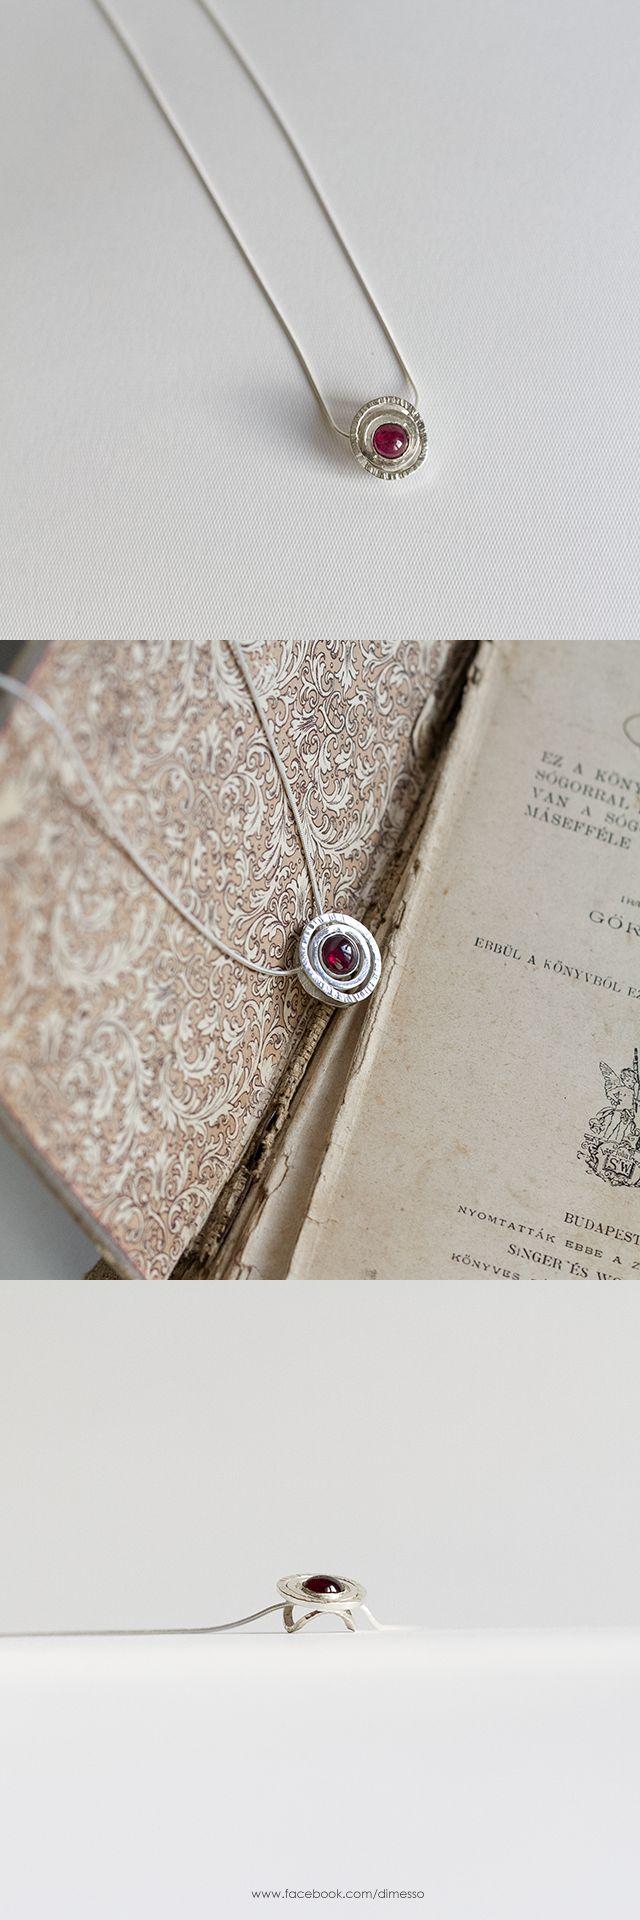 silver pendant with garnet www.facebook.com/dimesso